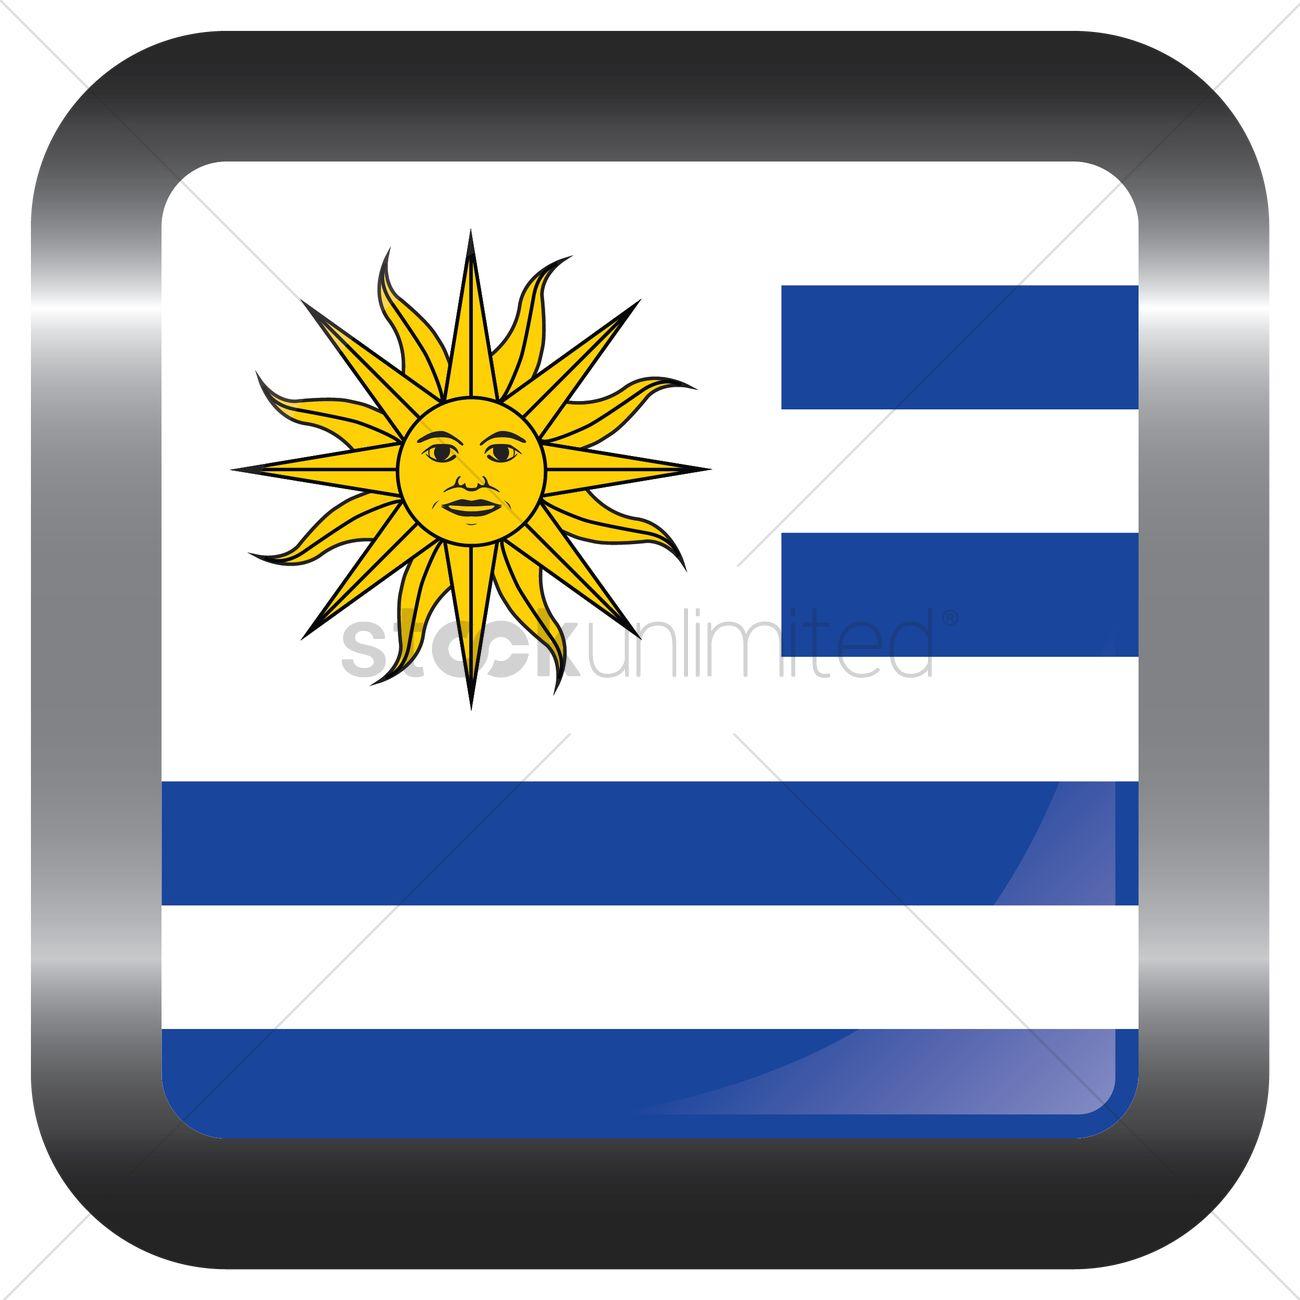 Uruguay Flag Frame Vector Image StockUnlimited - Uruguay flag